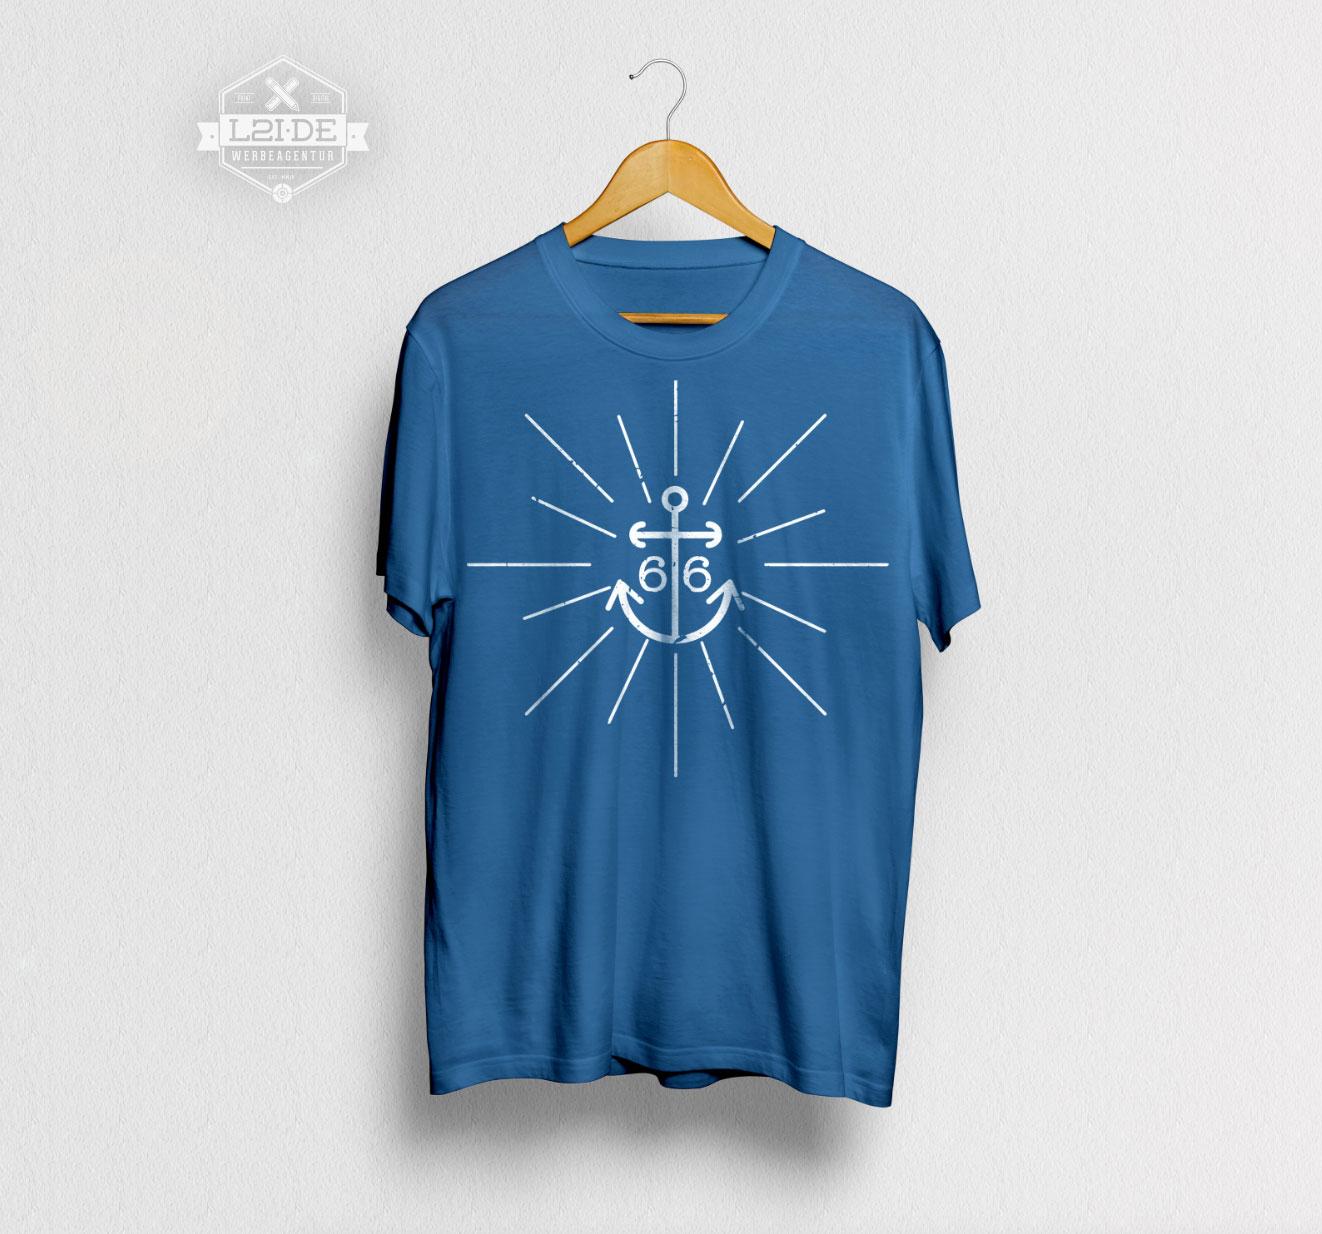 T-Shirt Ship66